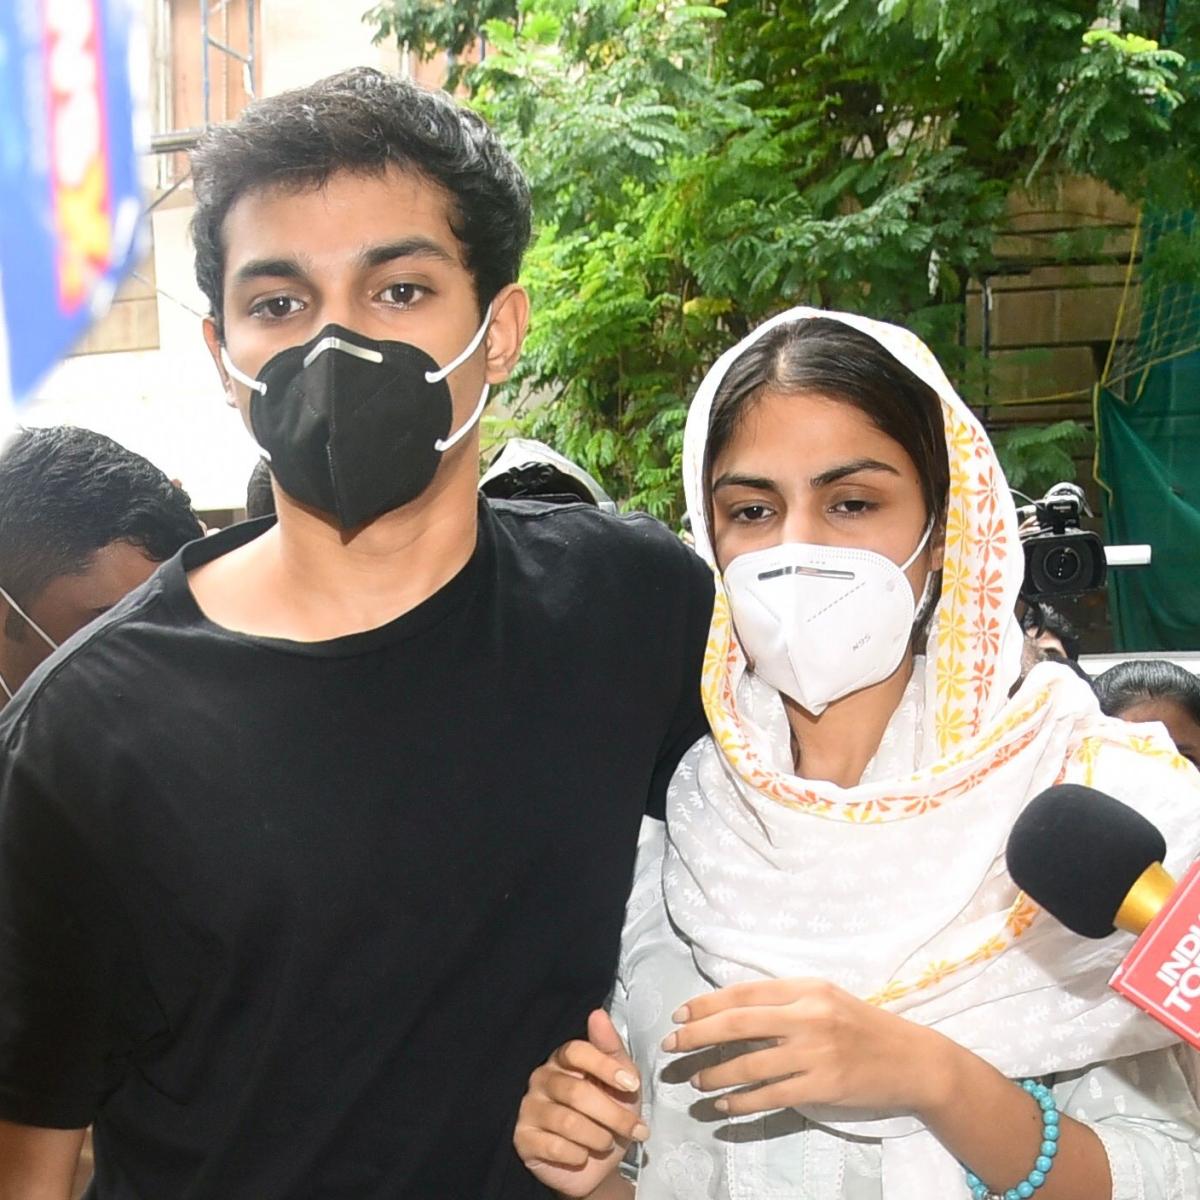 Rhea, Showik Chakraborty's judicial custody further extended till October 20